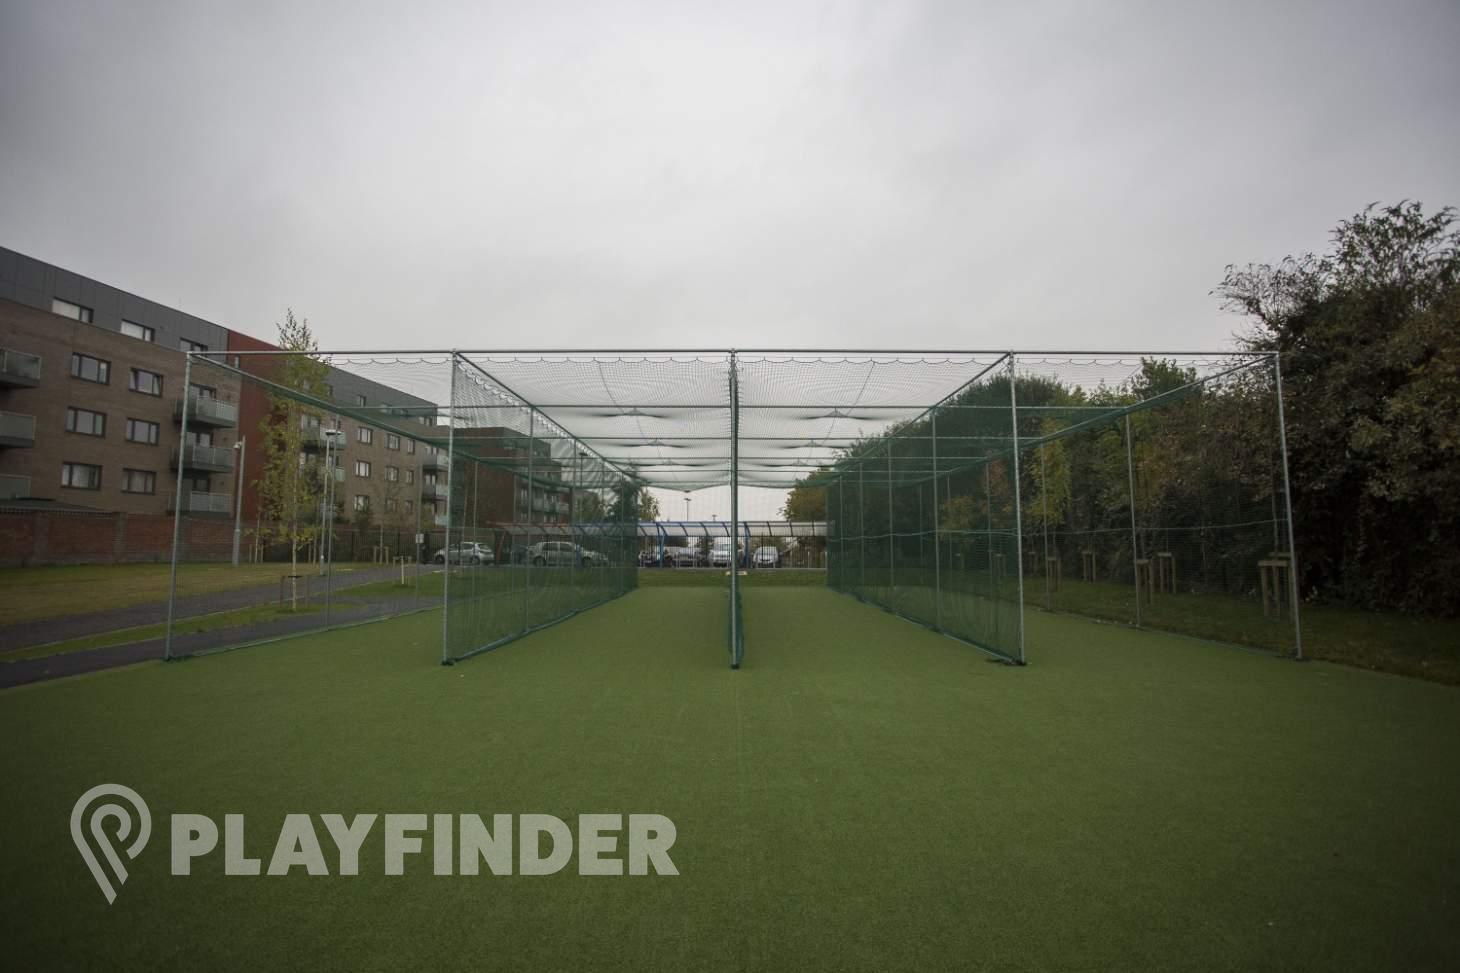 Crest Academy Nets | Artificial cricket facilities